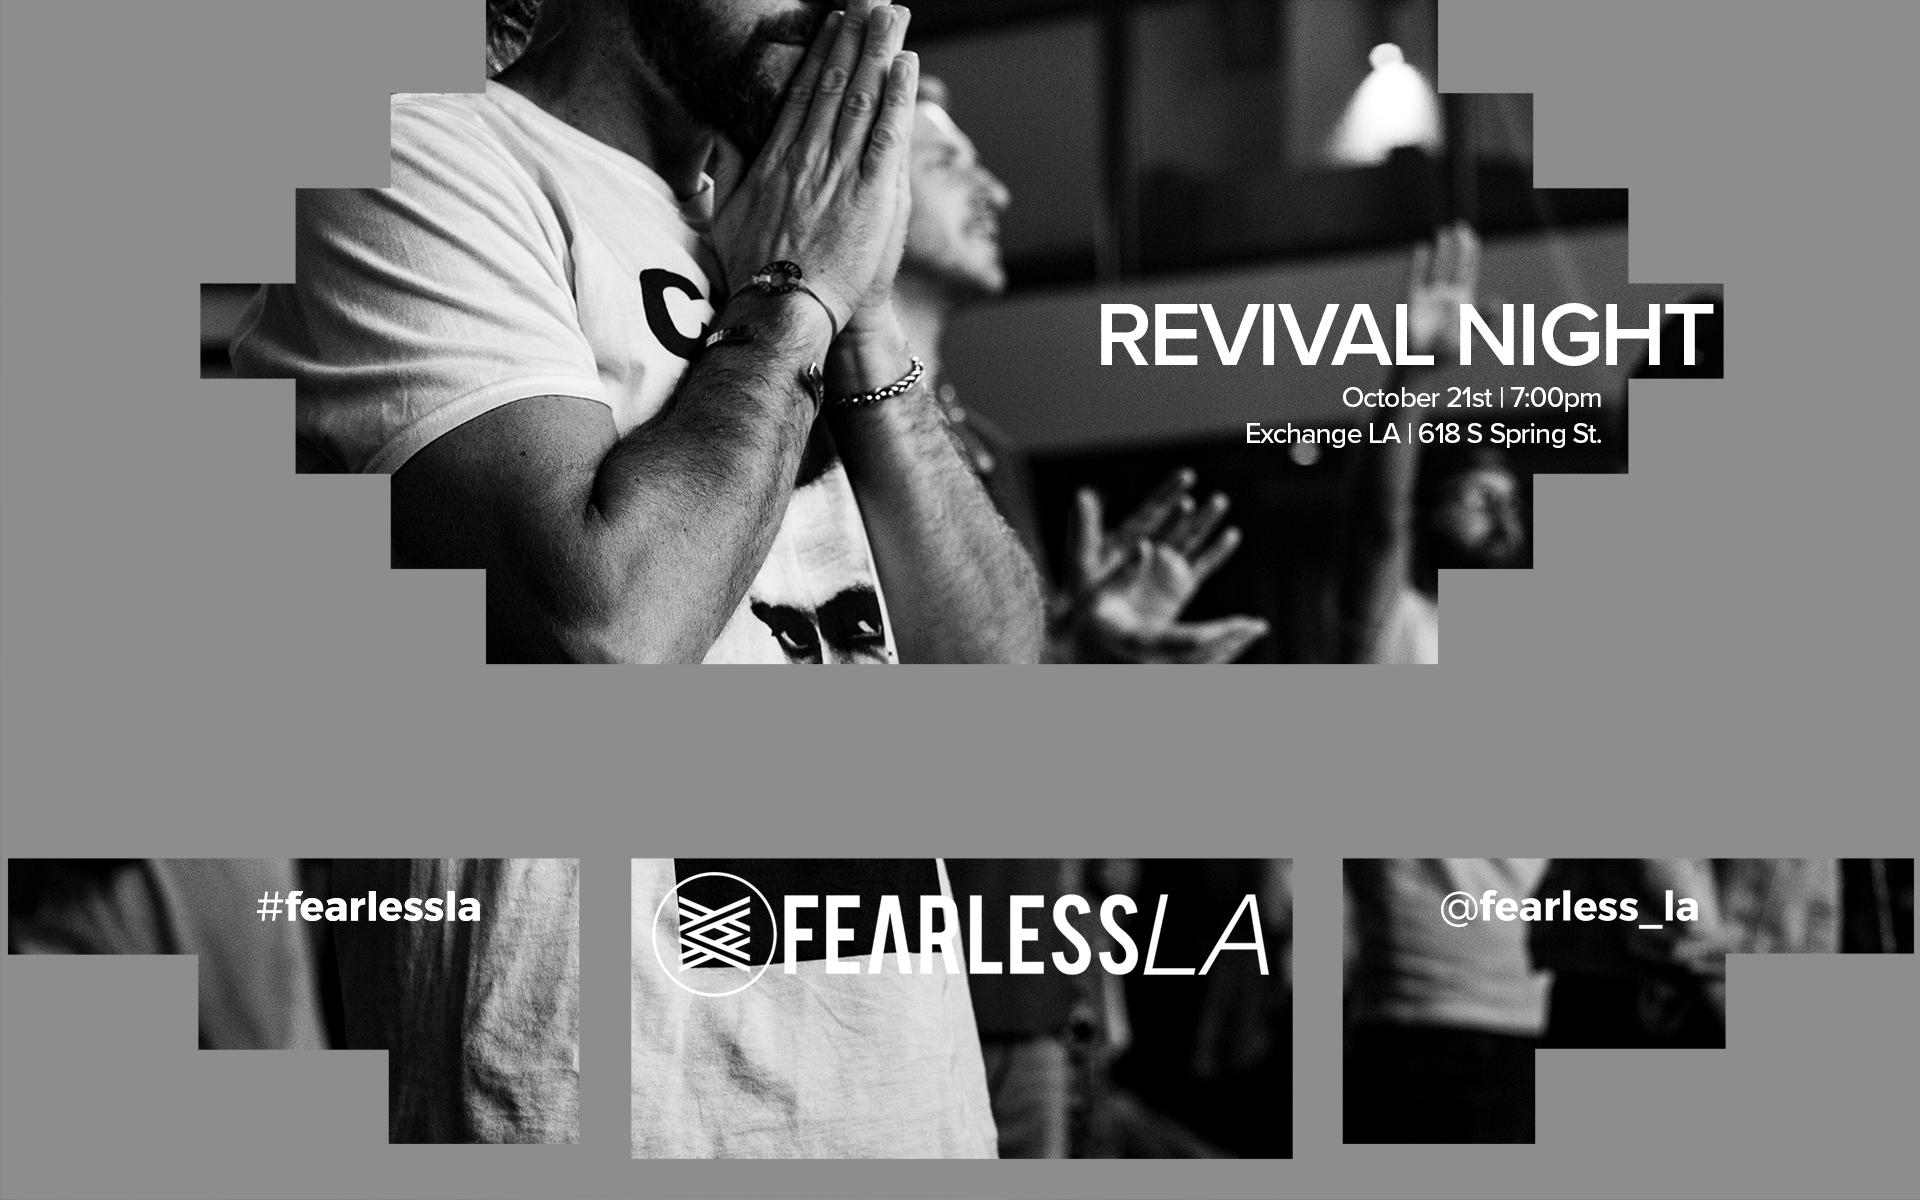 RevivalNight_withexla.jpg